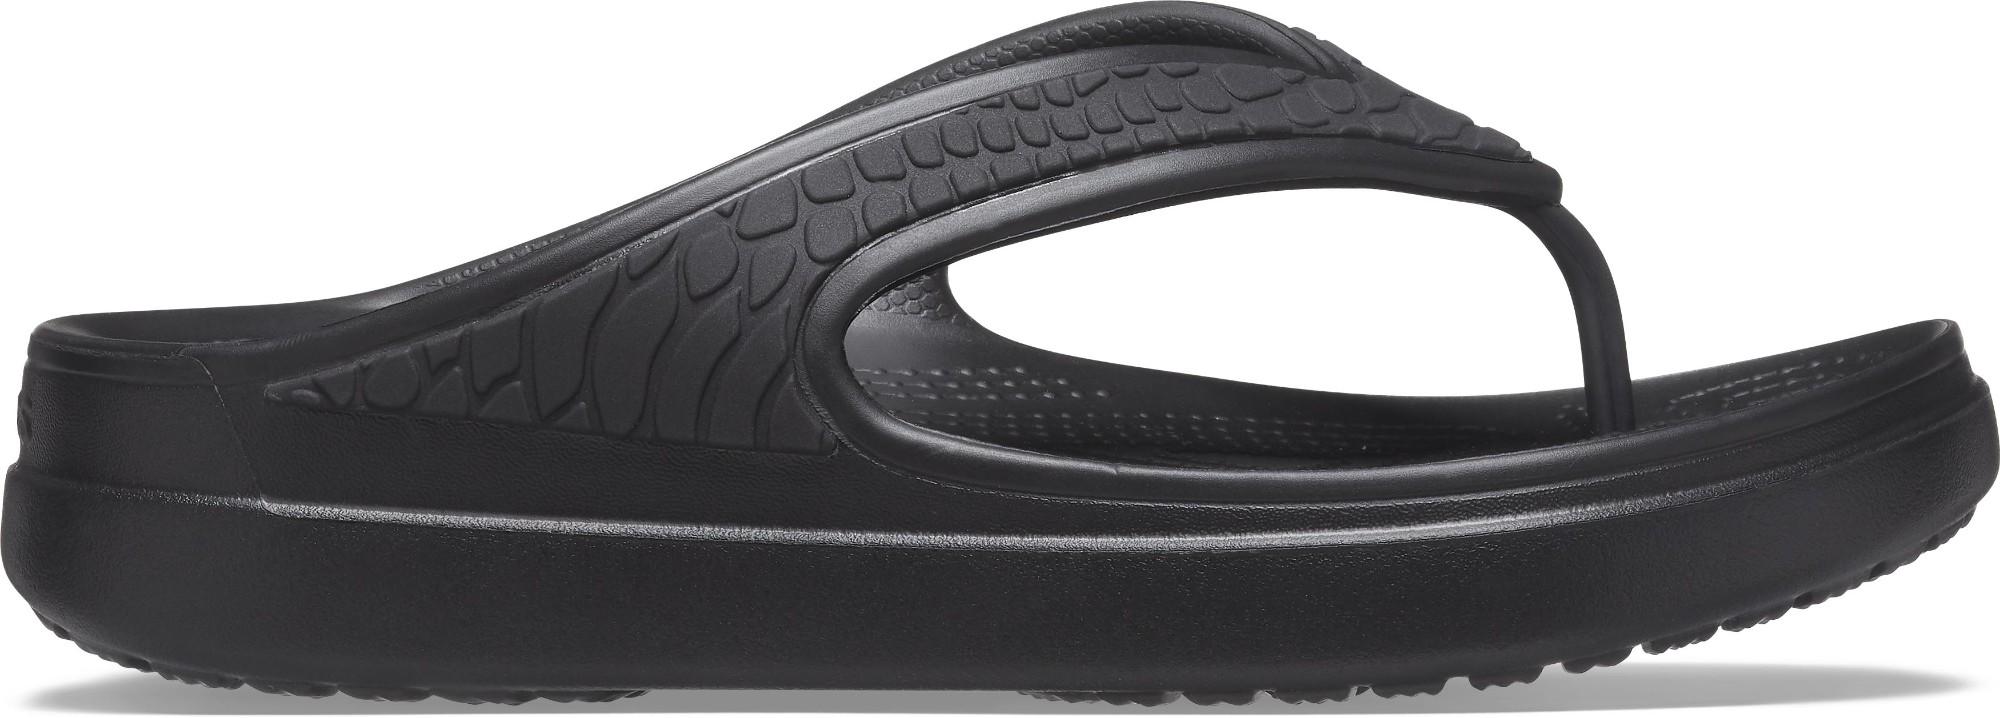 Crocs™ Sloane Snake Wedge Flip Black 41